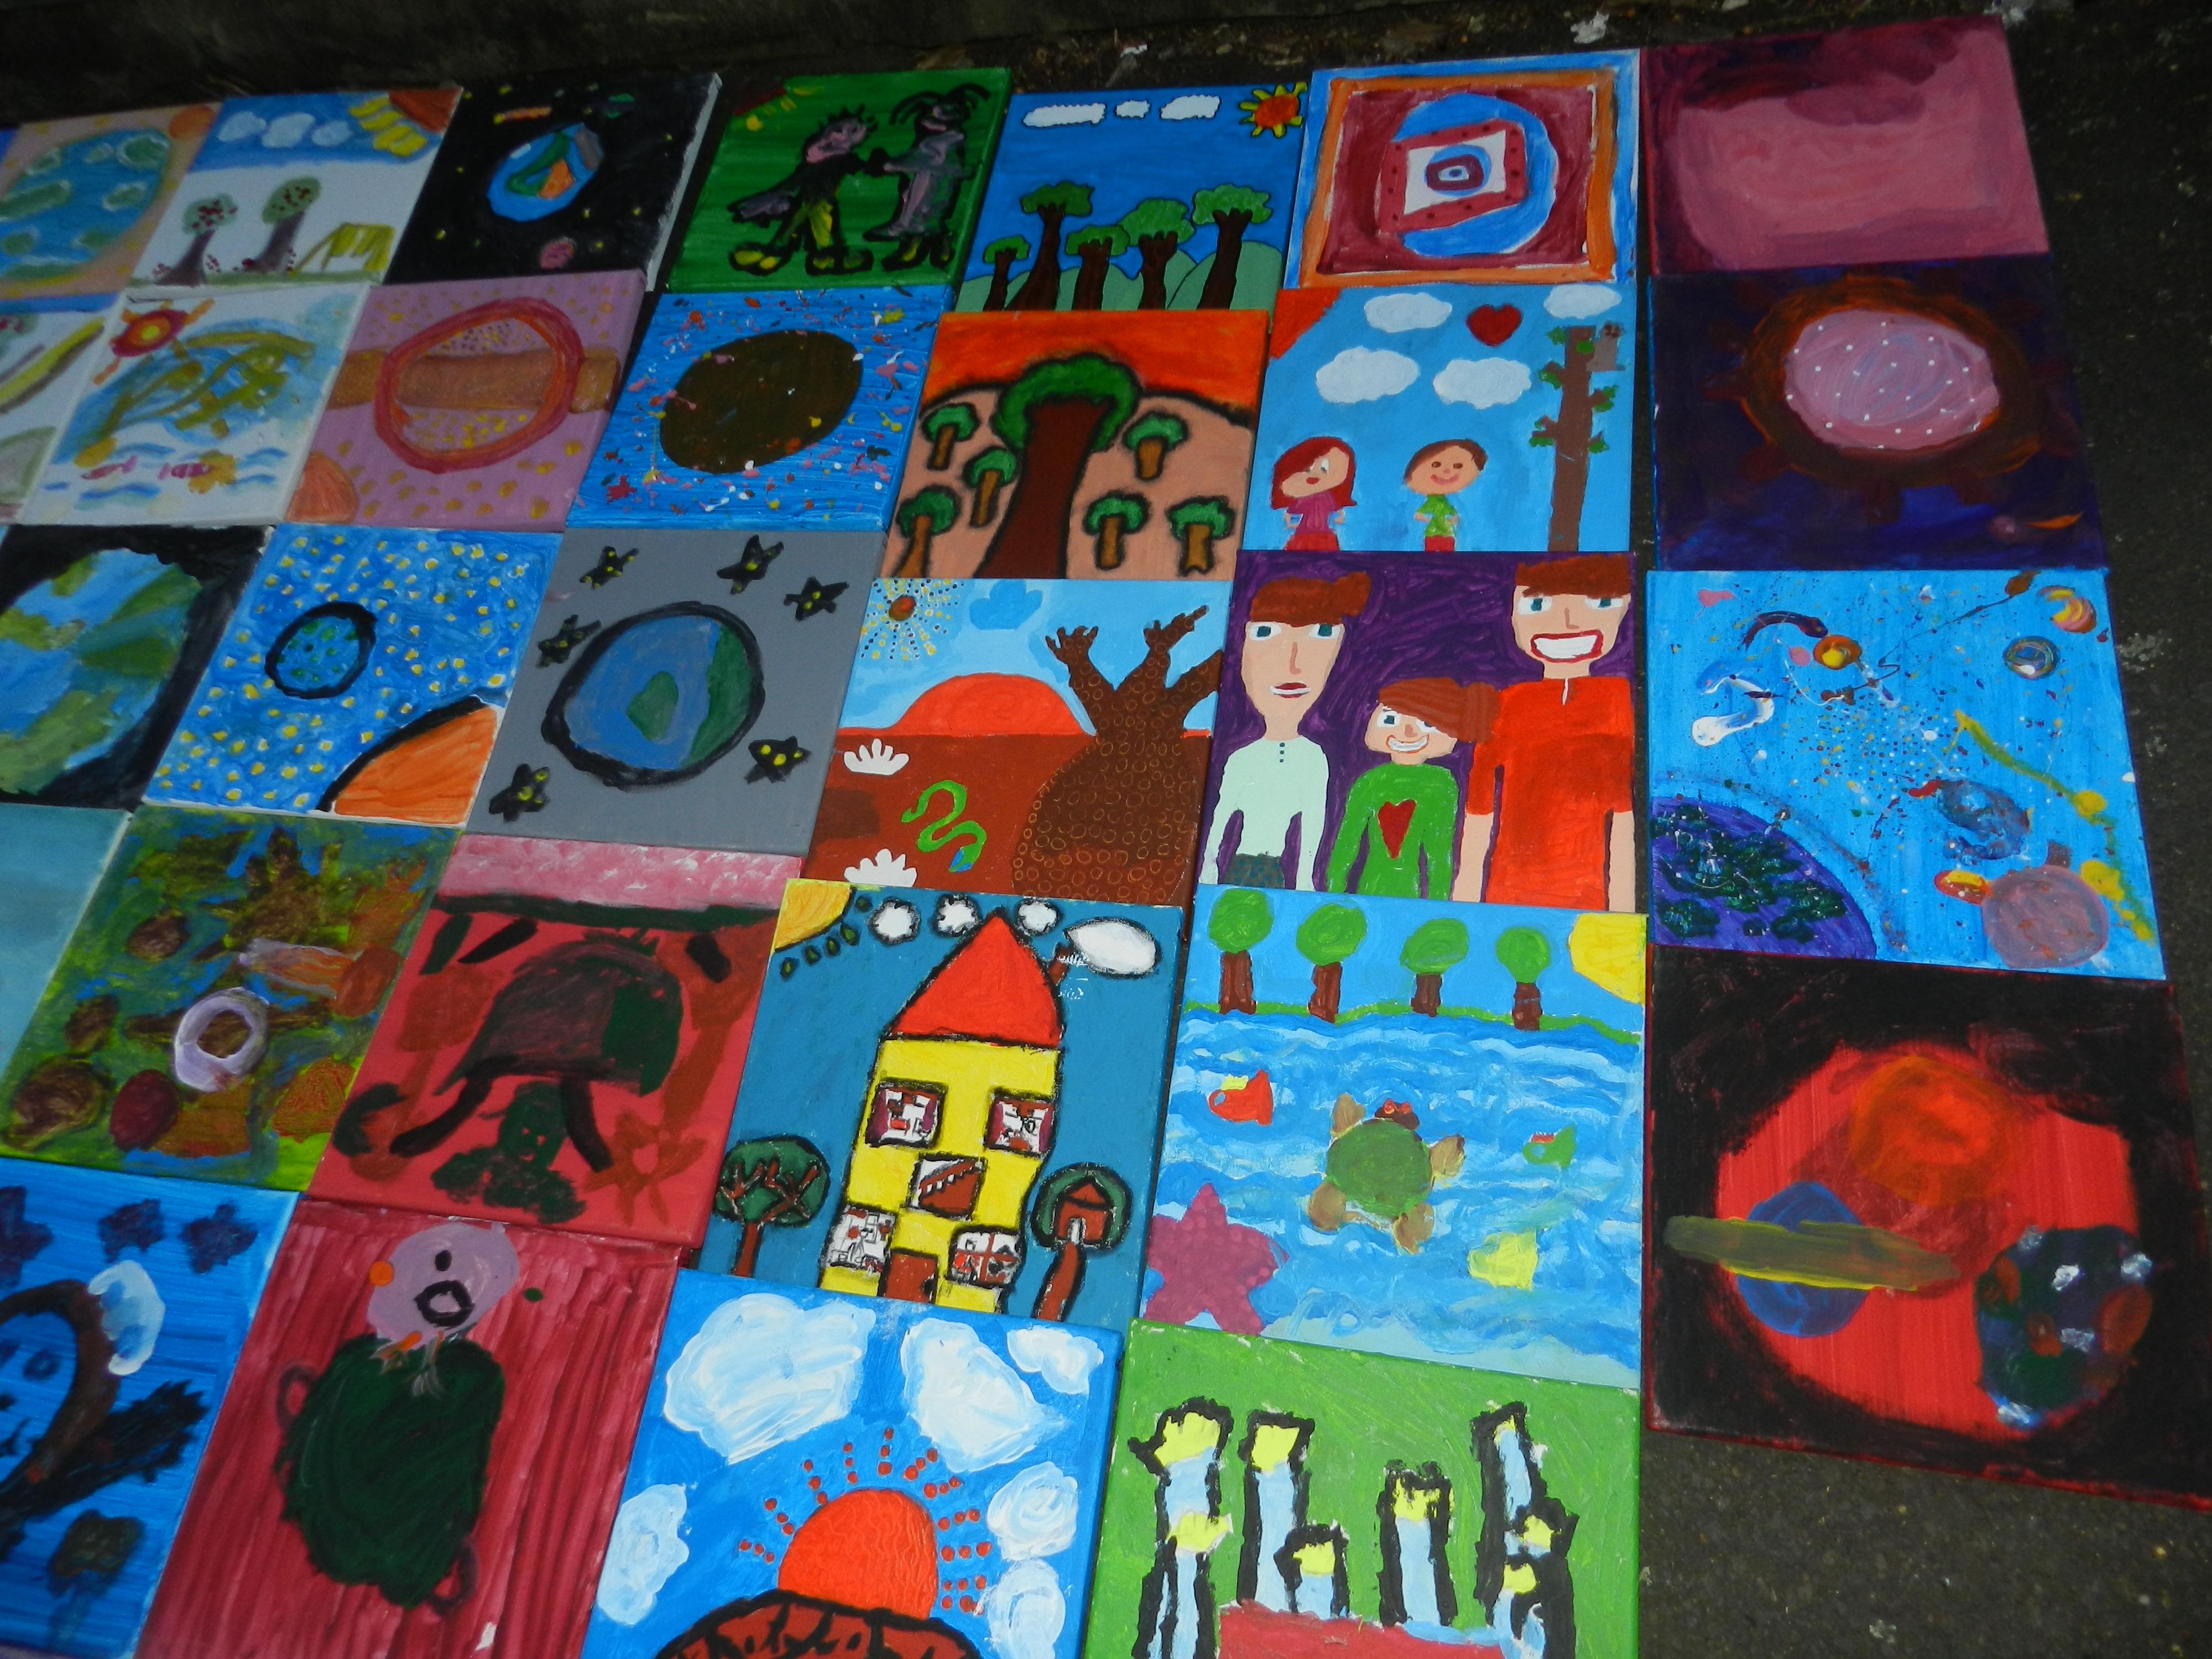 Sunday Kids Science Art Workshops $25.00 per kid per class in School term time